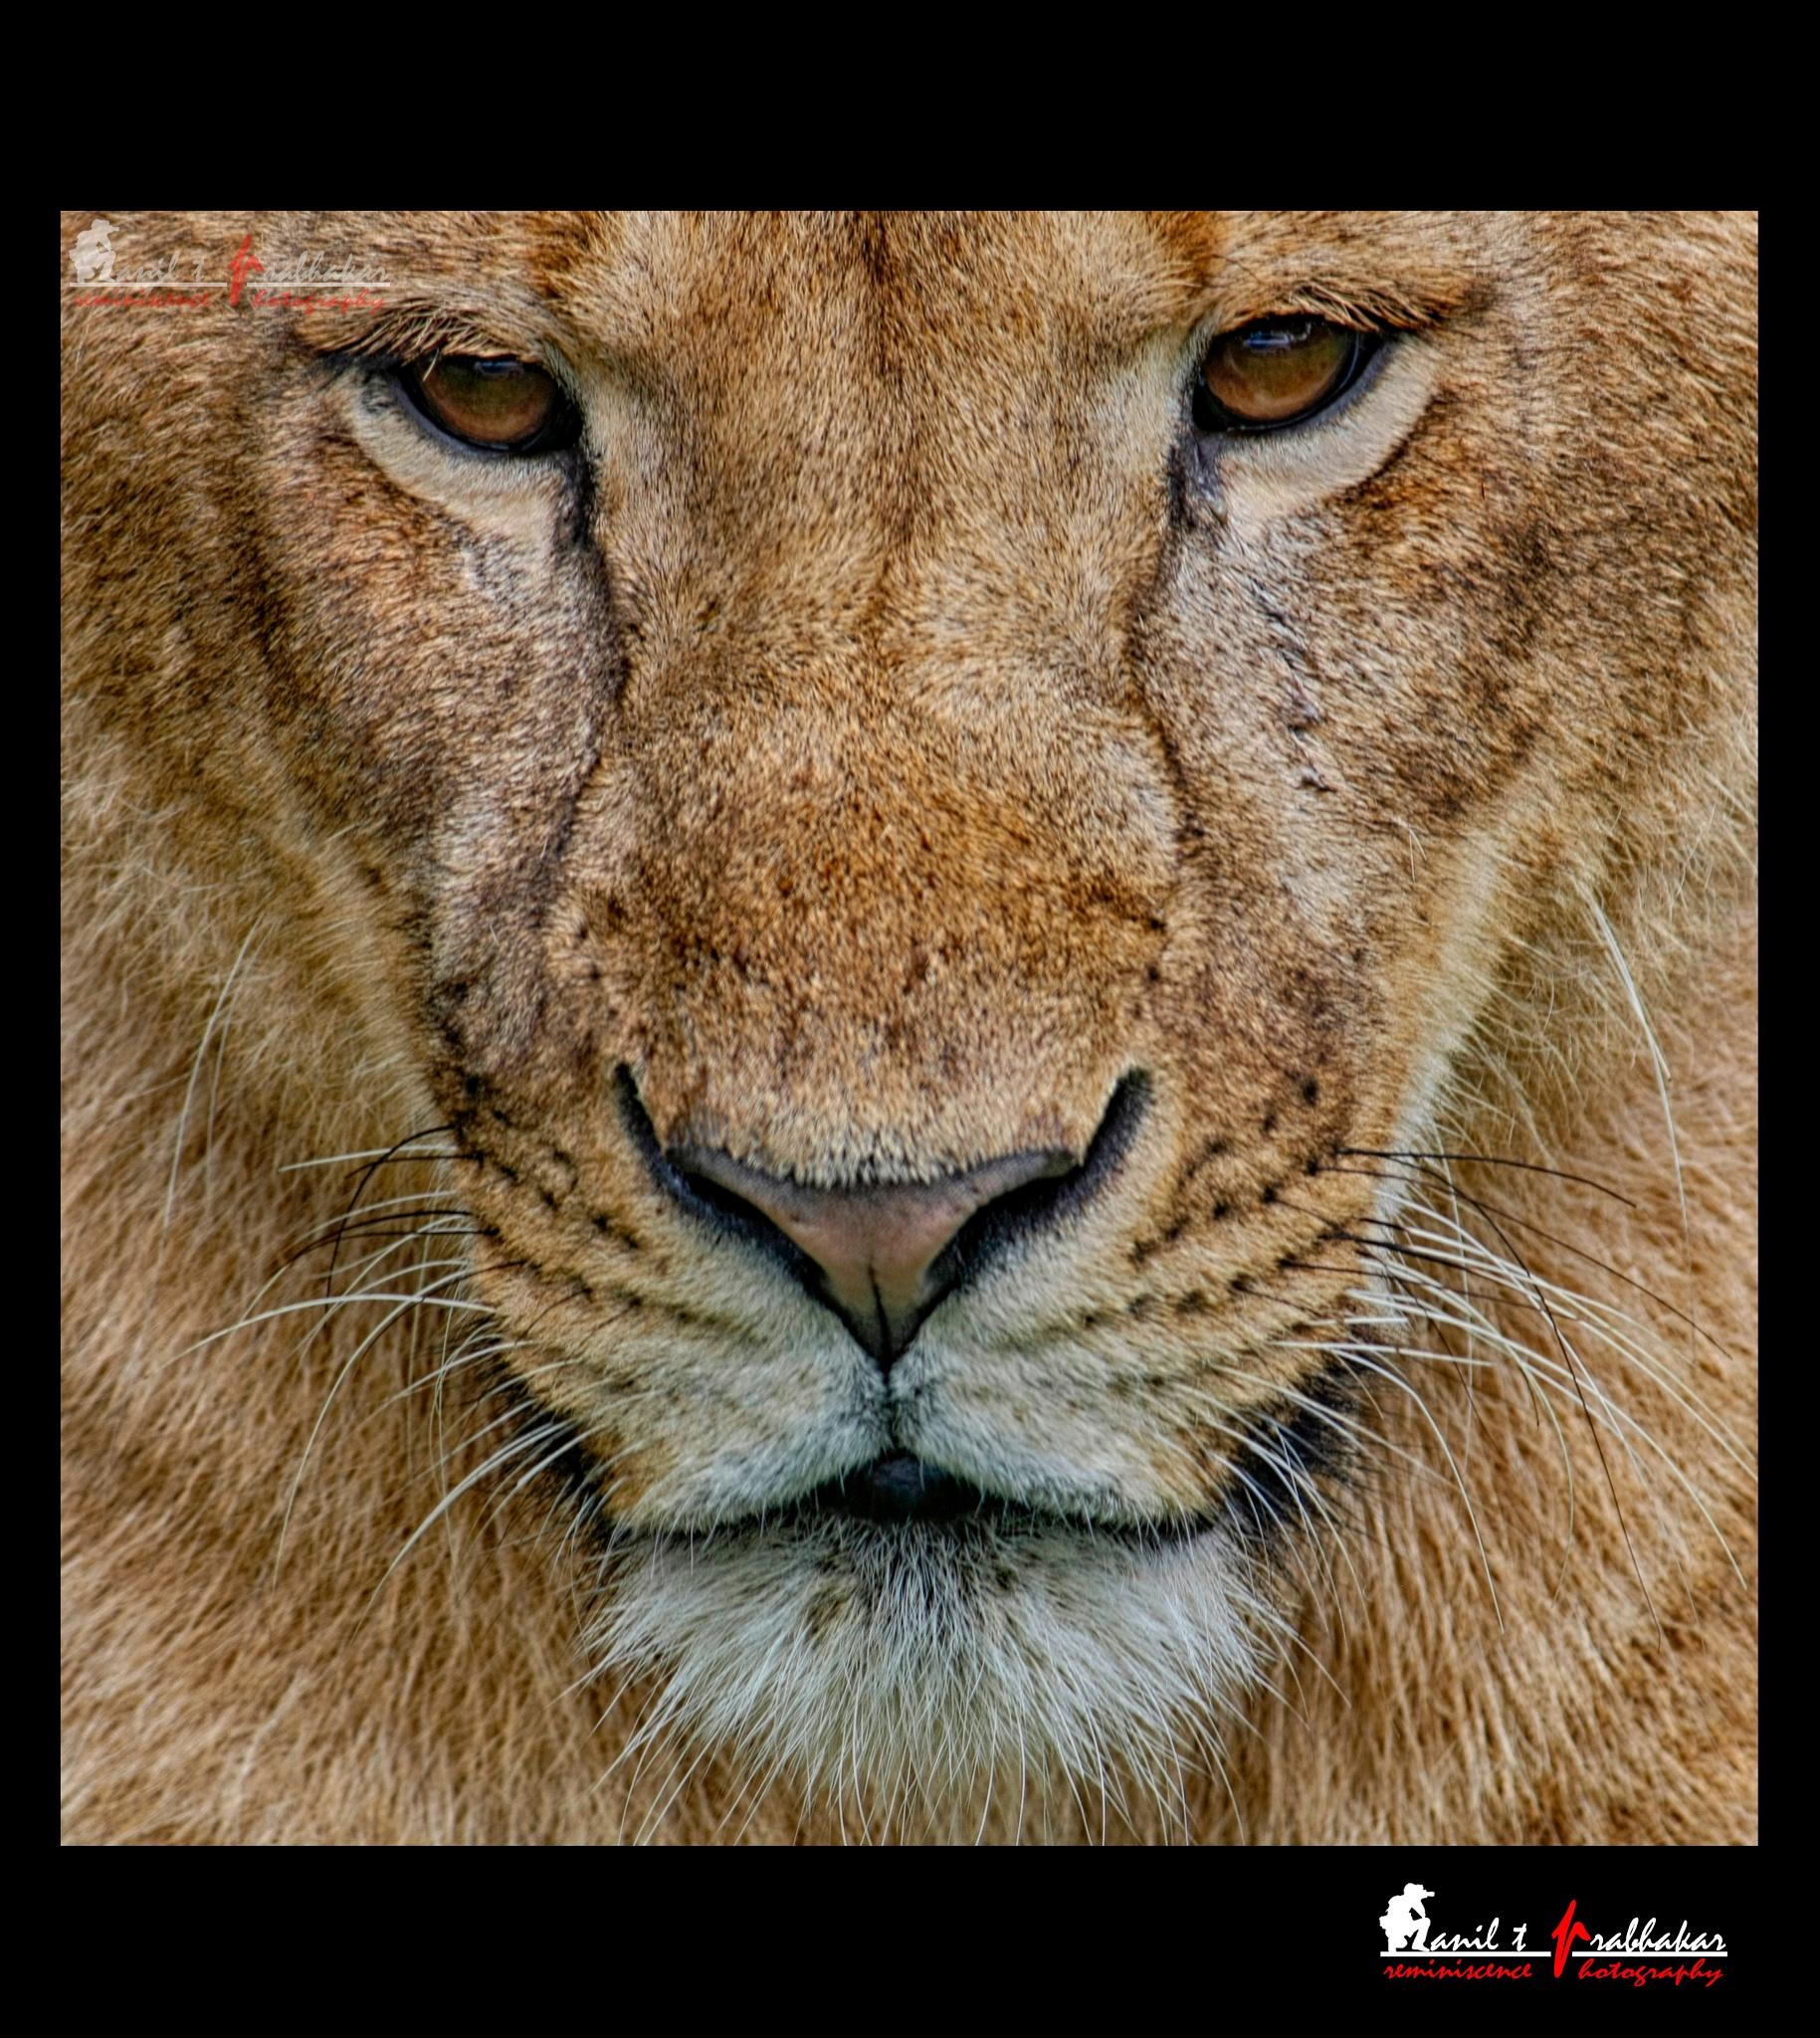 Lion by Anil T Prabhakar